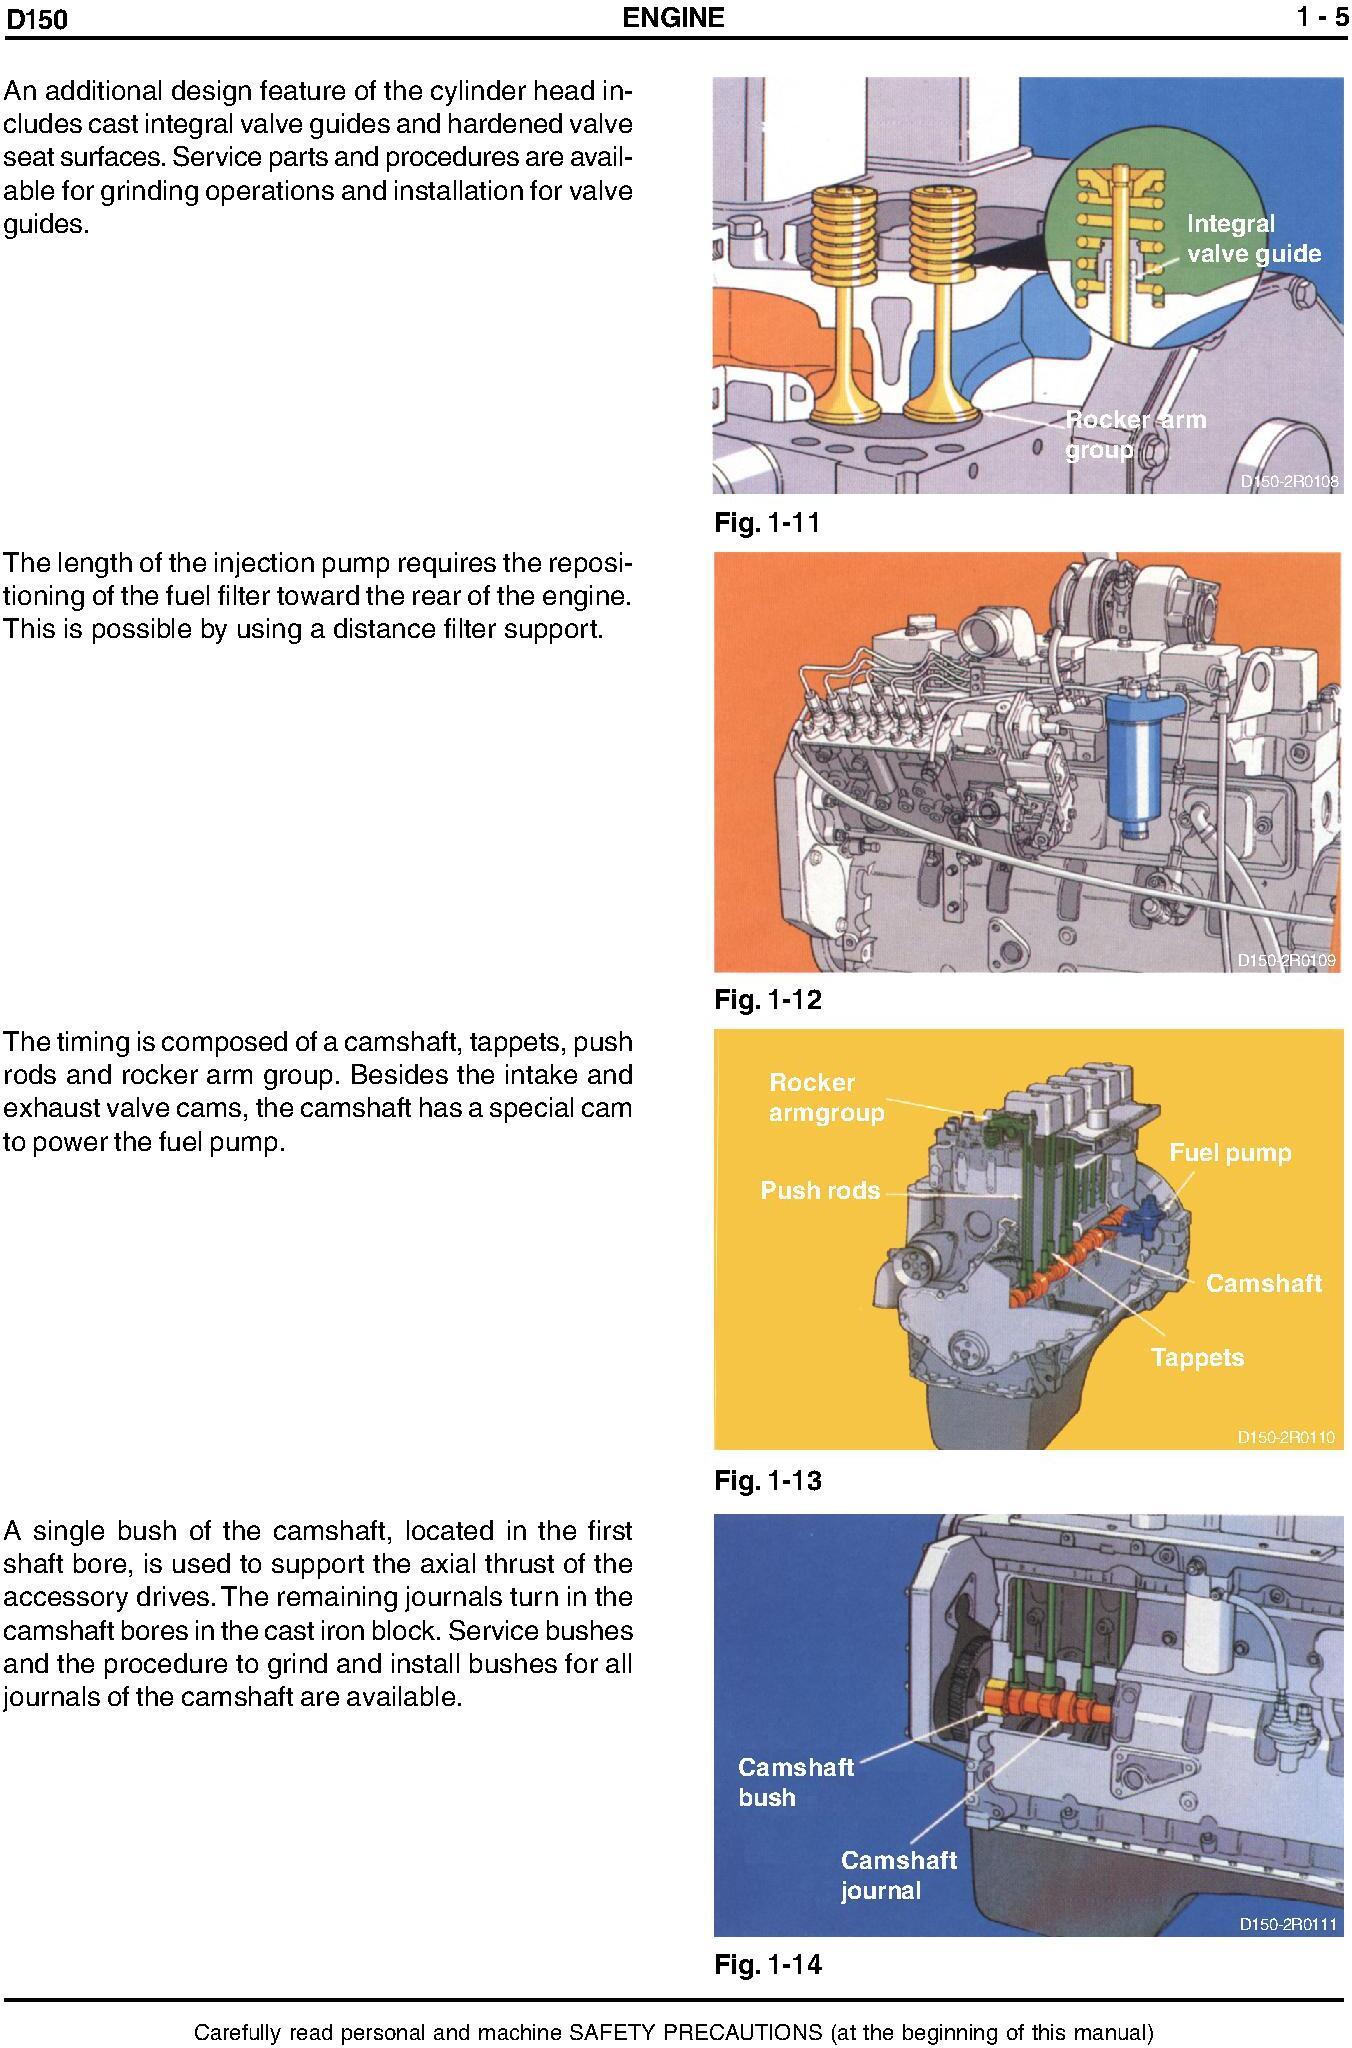 New Holland D150 Tier Crawler Dozer 2 Service Manual - 2